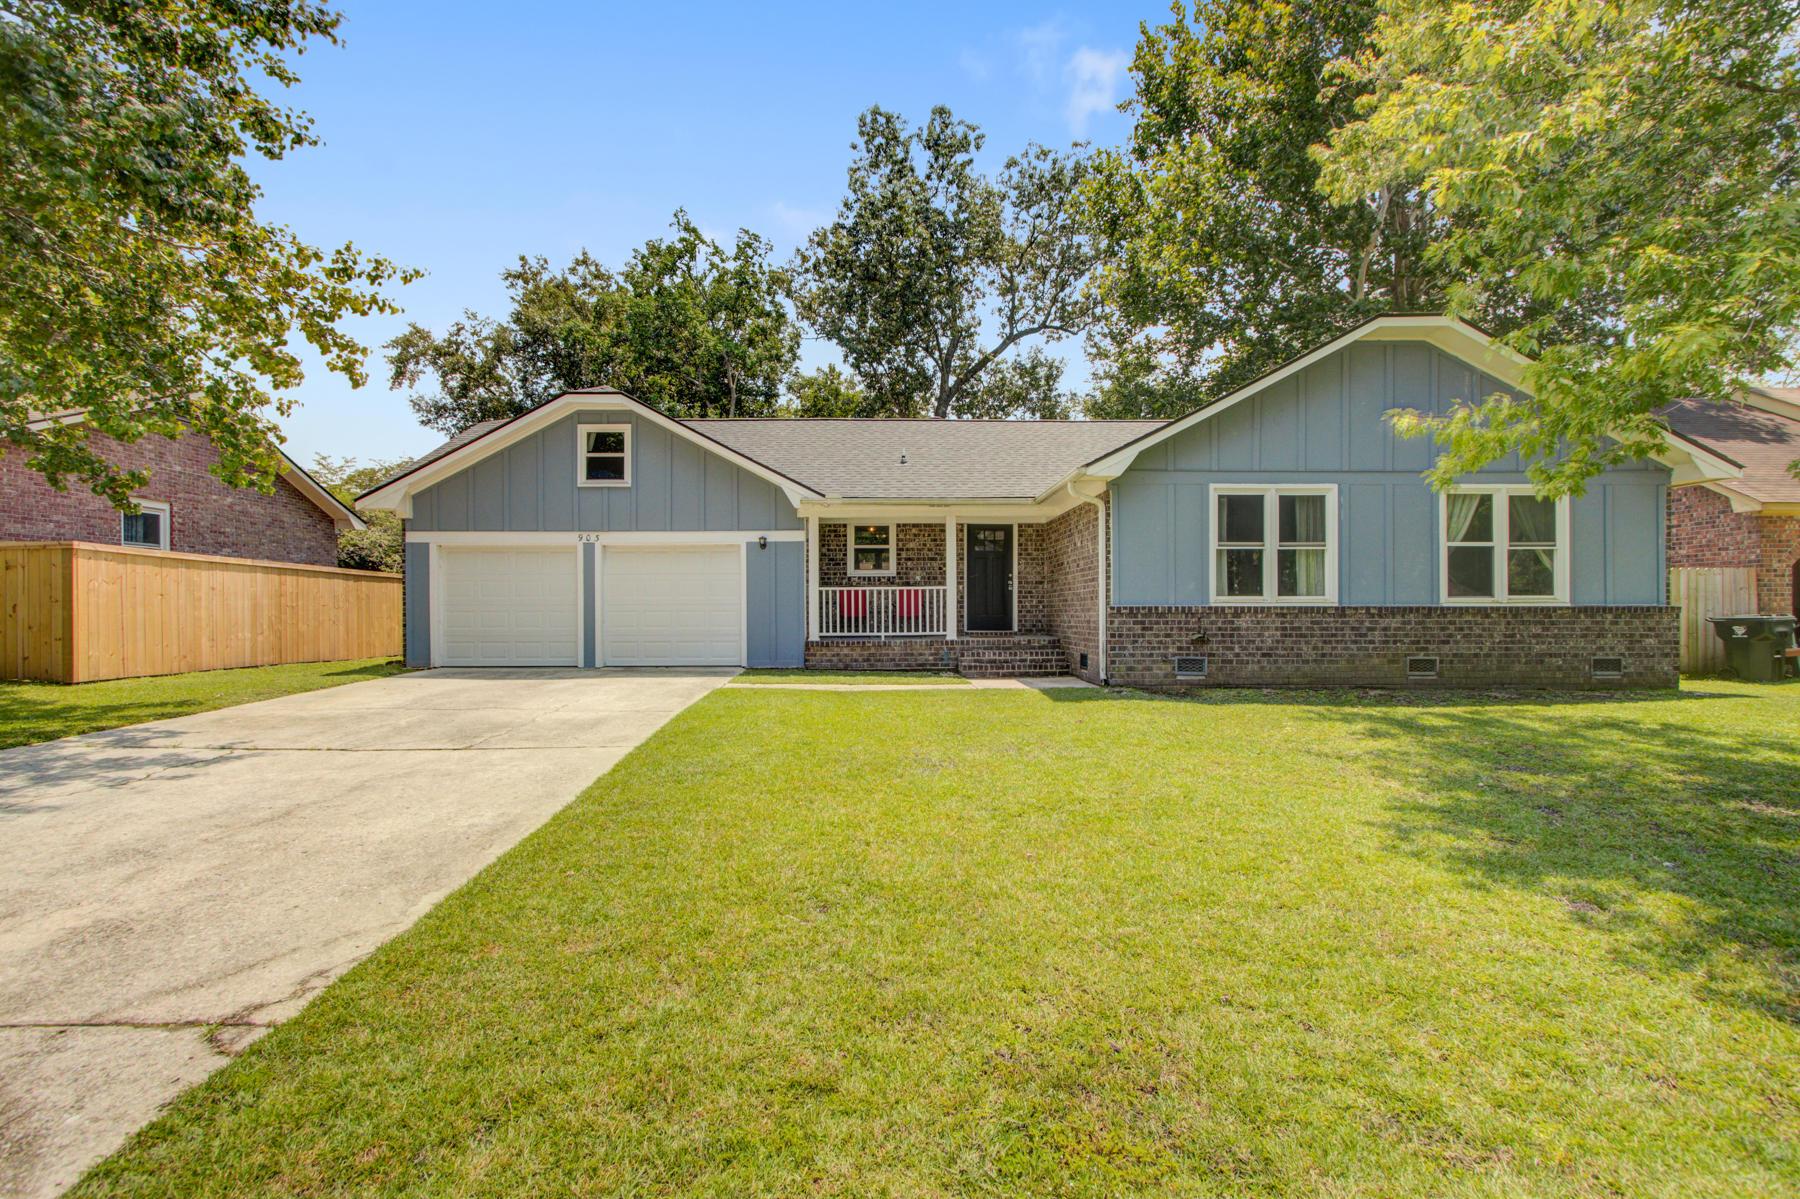 903 Larch Pine Drive Ladson, SC 29456